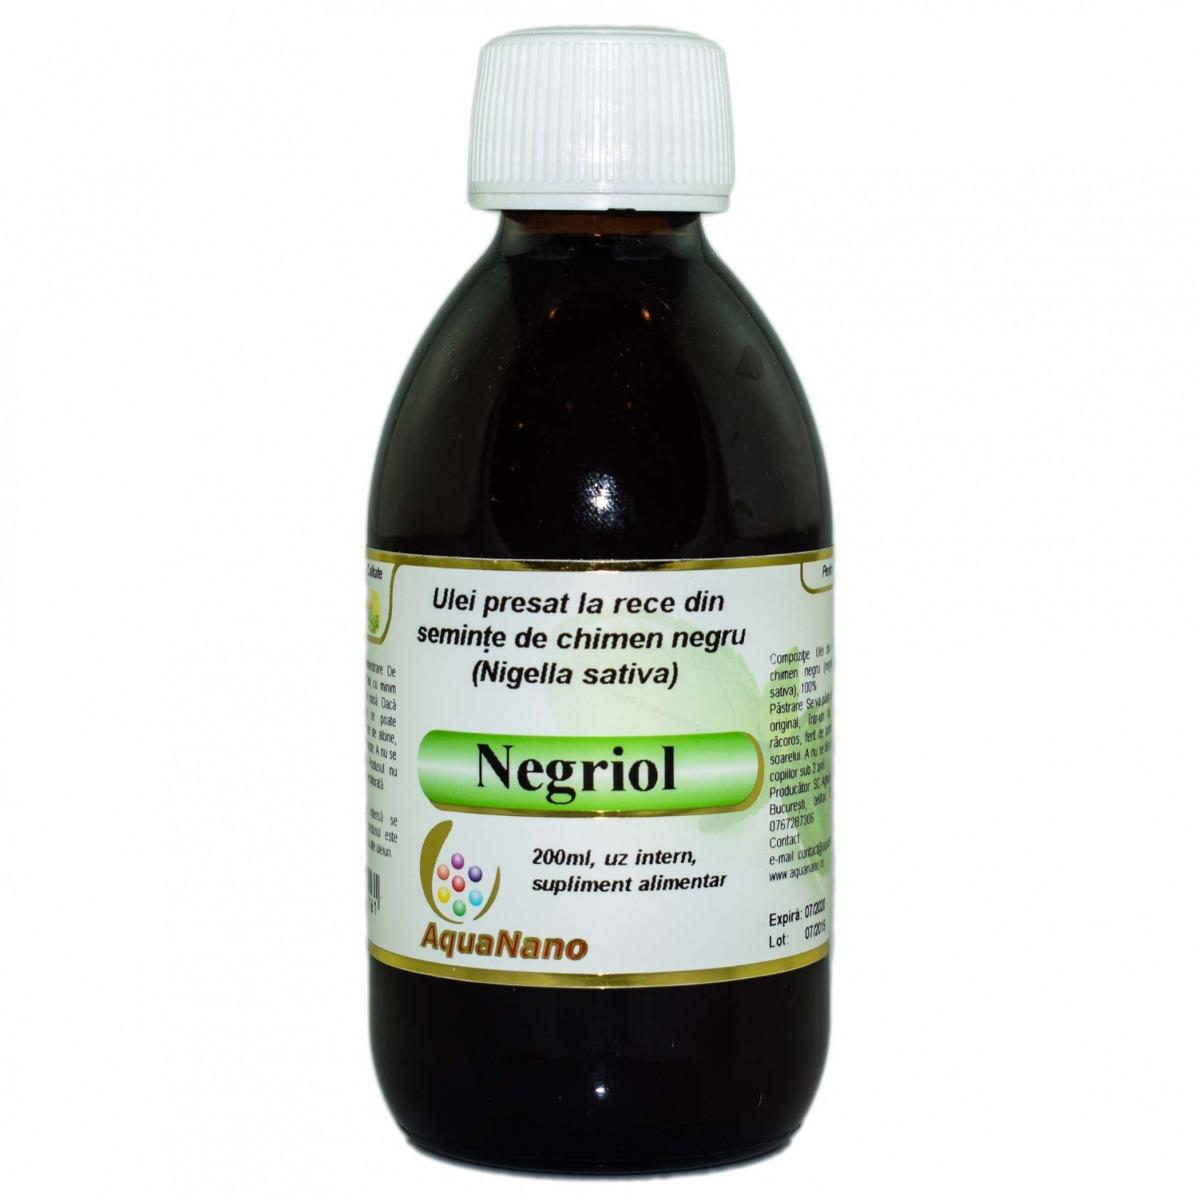 Negriol - Ulei de negrilica presat la rece, 200ml, Aghoras drmax.ro